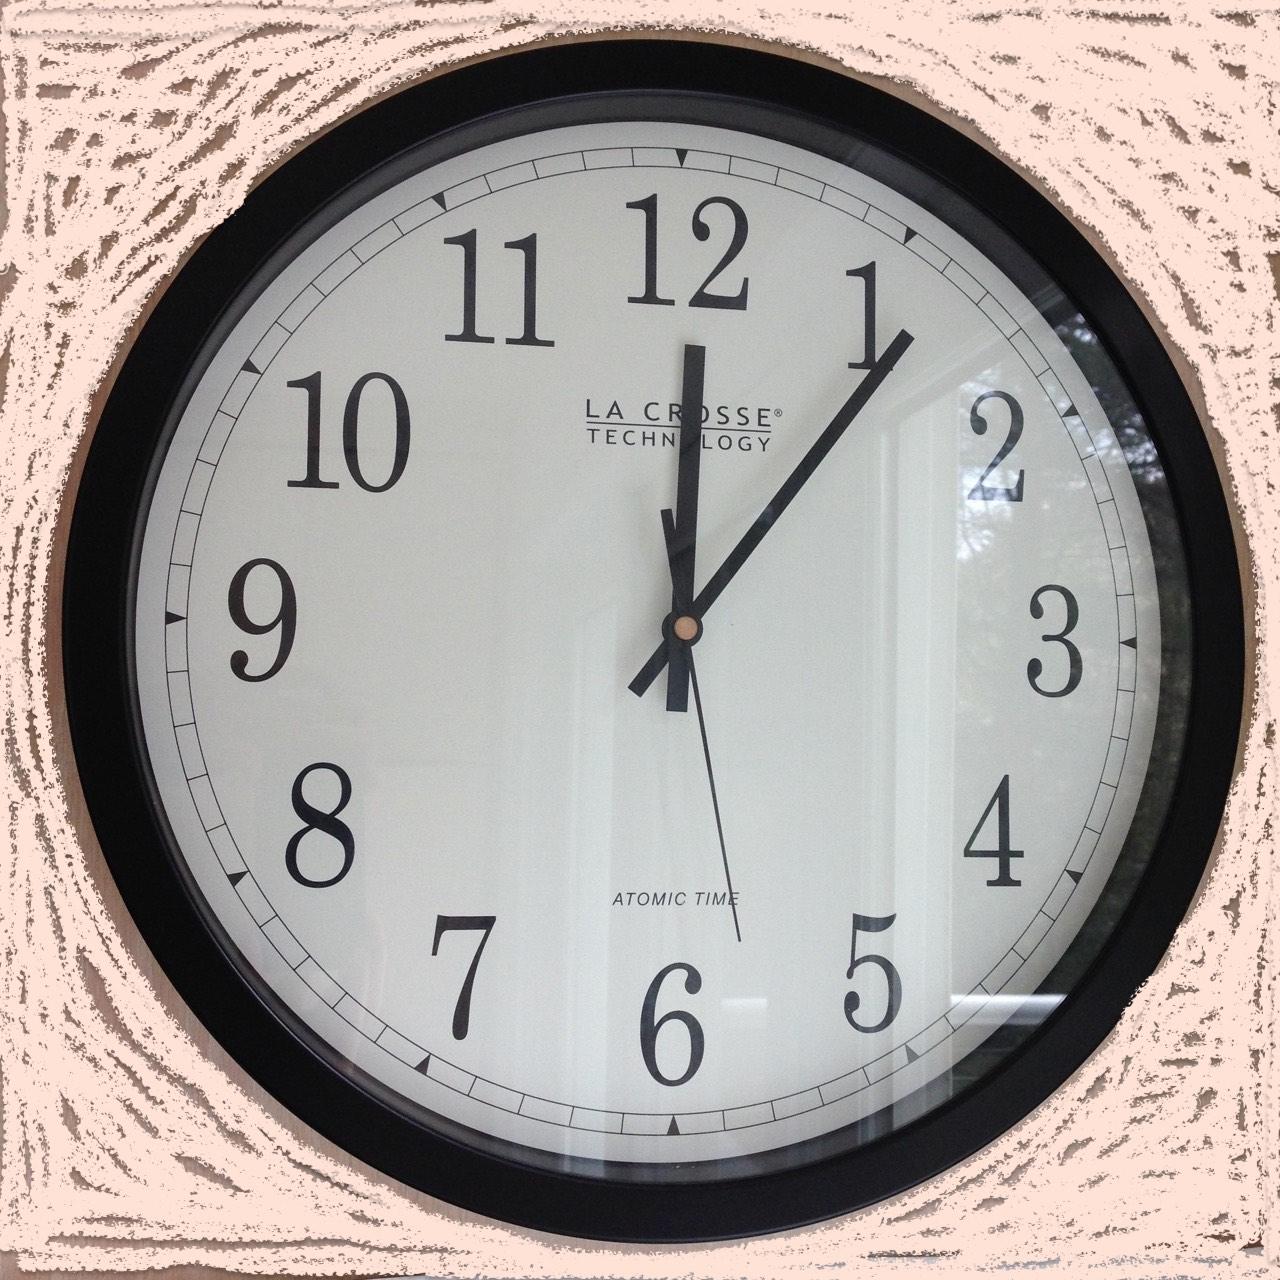 Analog wall clock showing 12:06